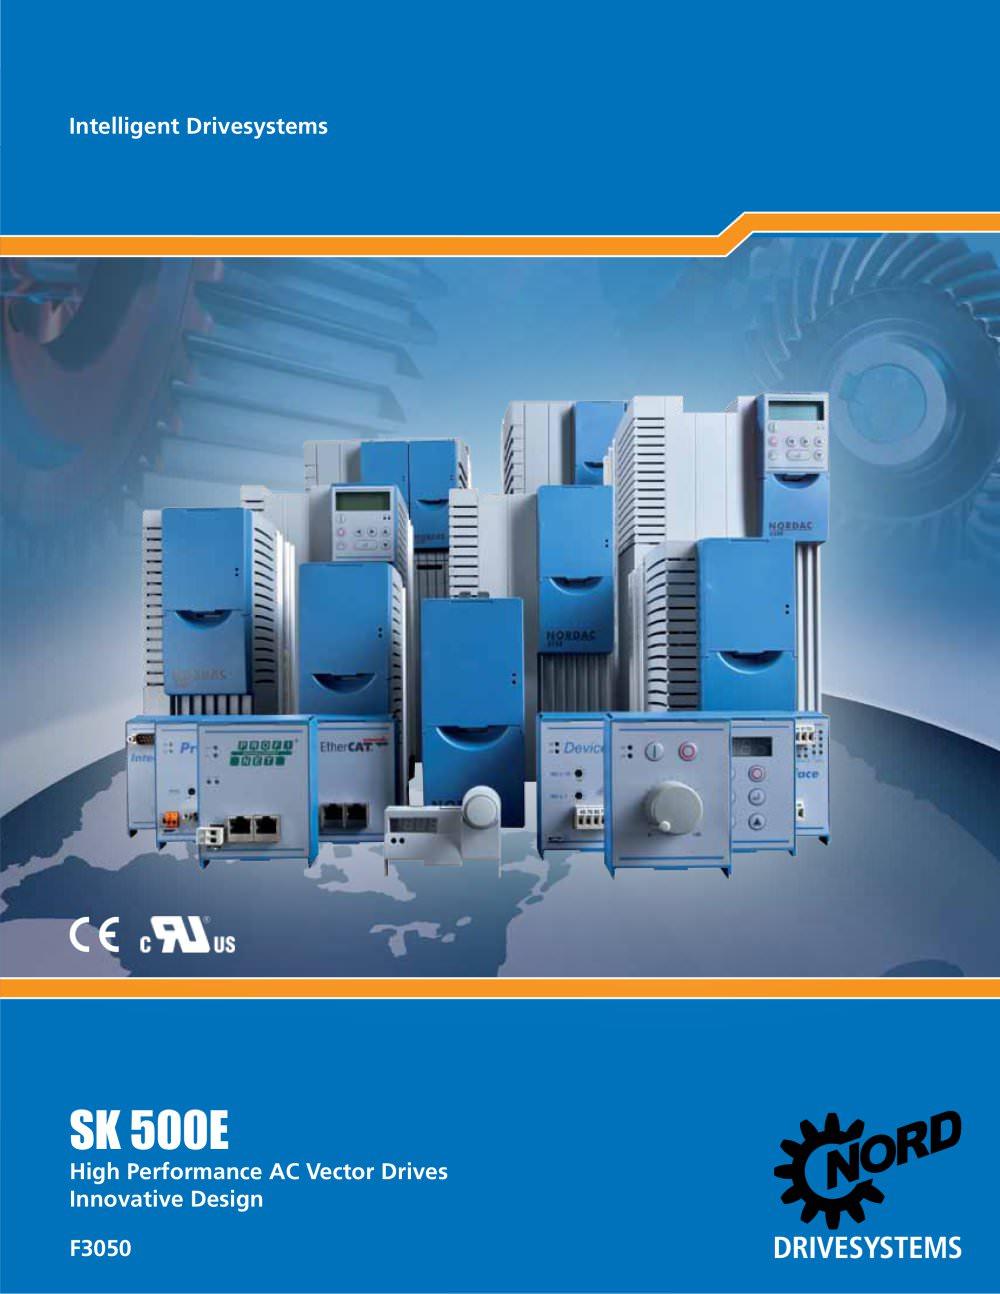 sk 500e flyer unit 25 145263_1b sk 500e flyer unit 25 getriebebau nord gmbh & co kg pdf nord motor wiring diagram at alyssarenee.co